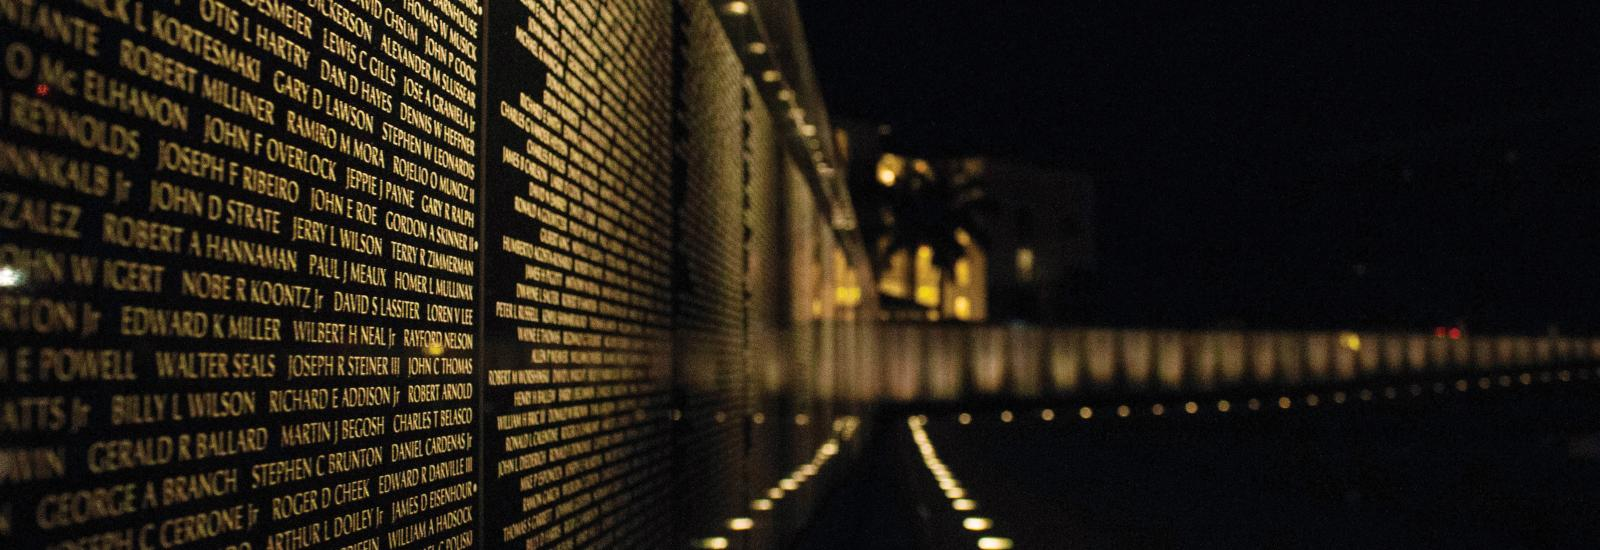 Vietnam Memorial Wall of SWFL